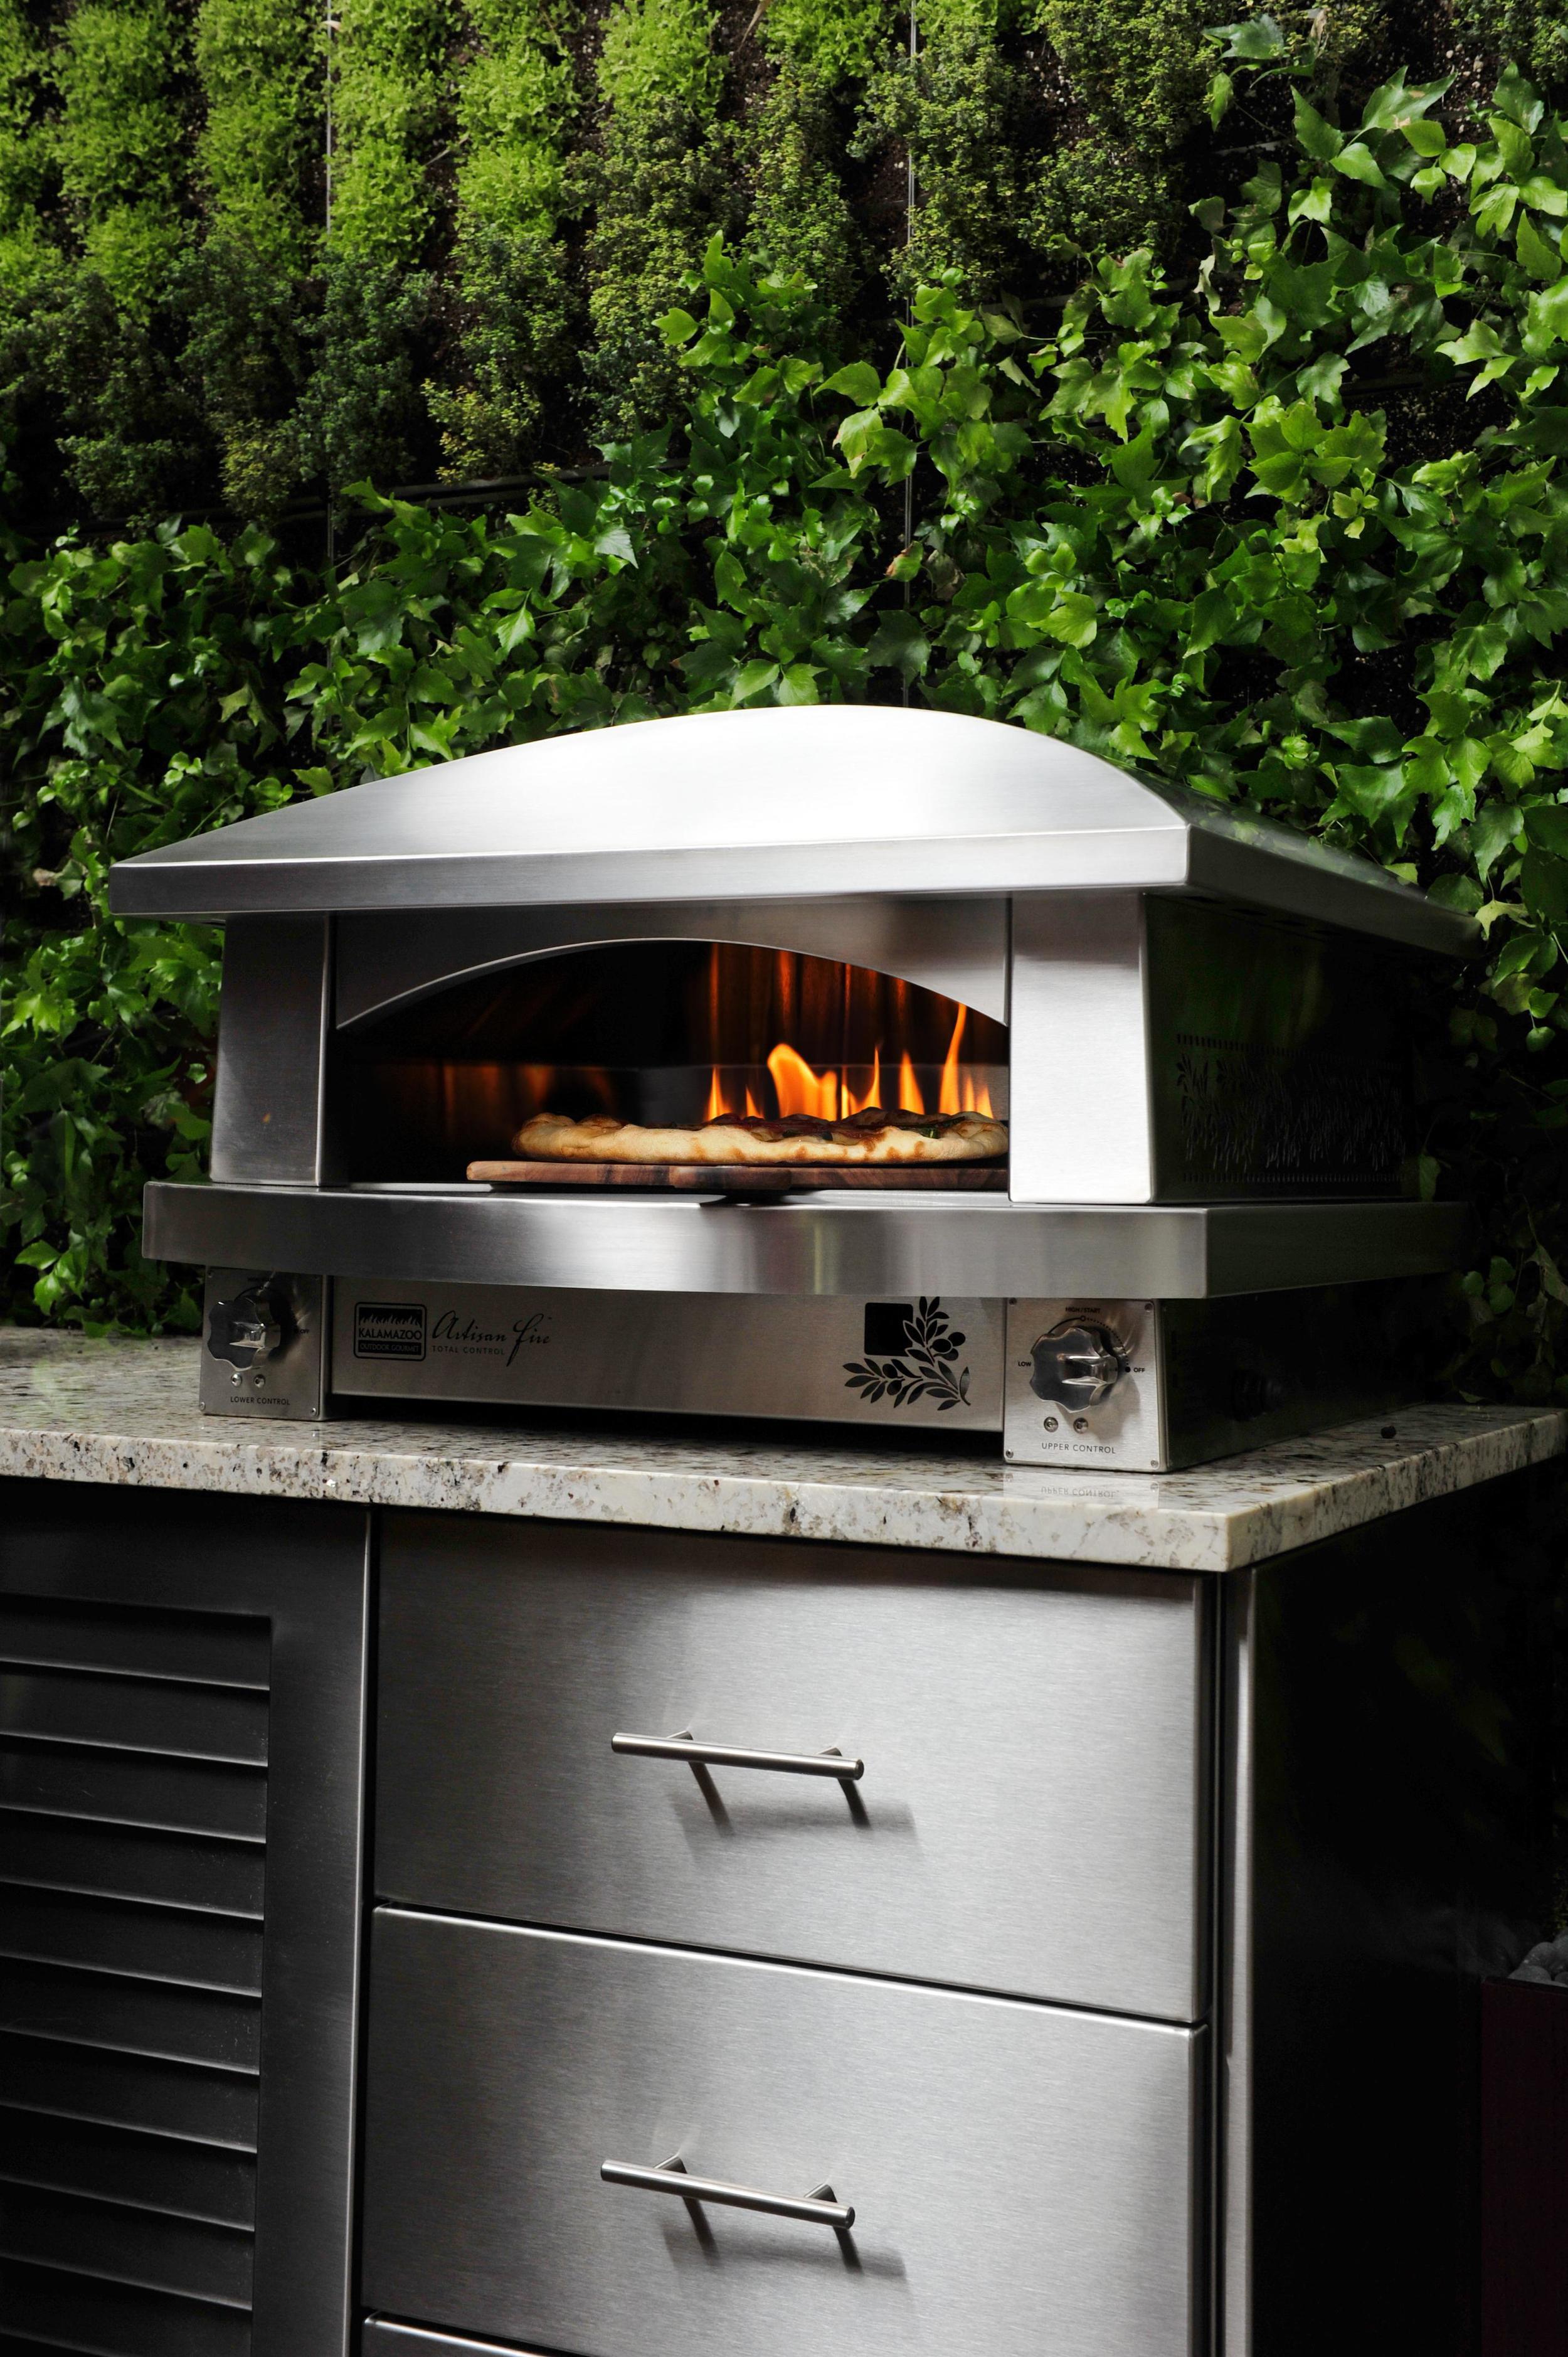 Kalamazoo's Artisan Fire pizza oven